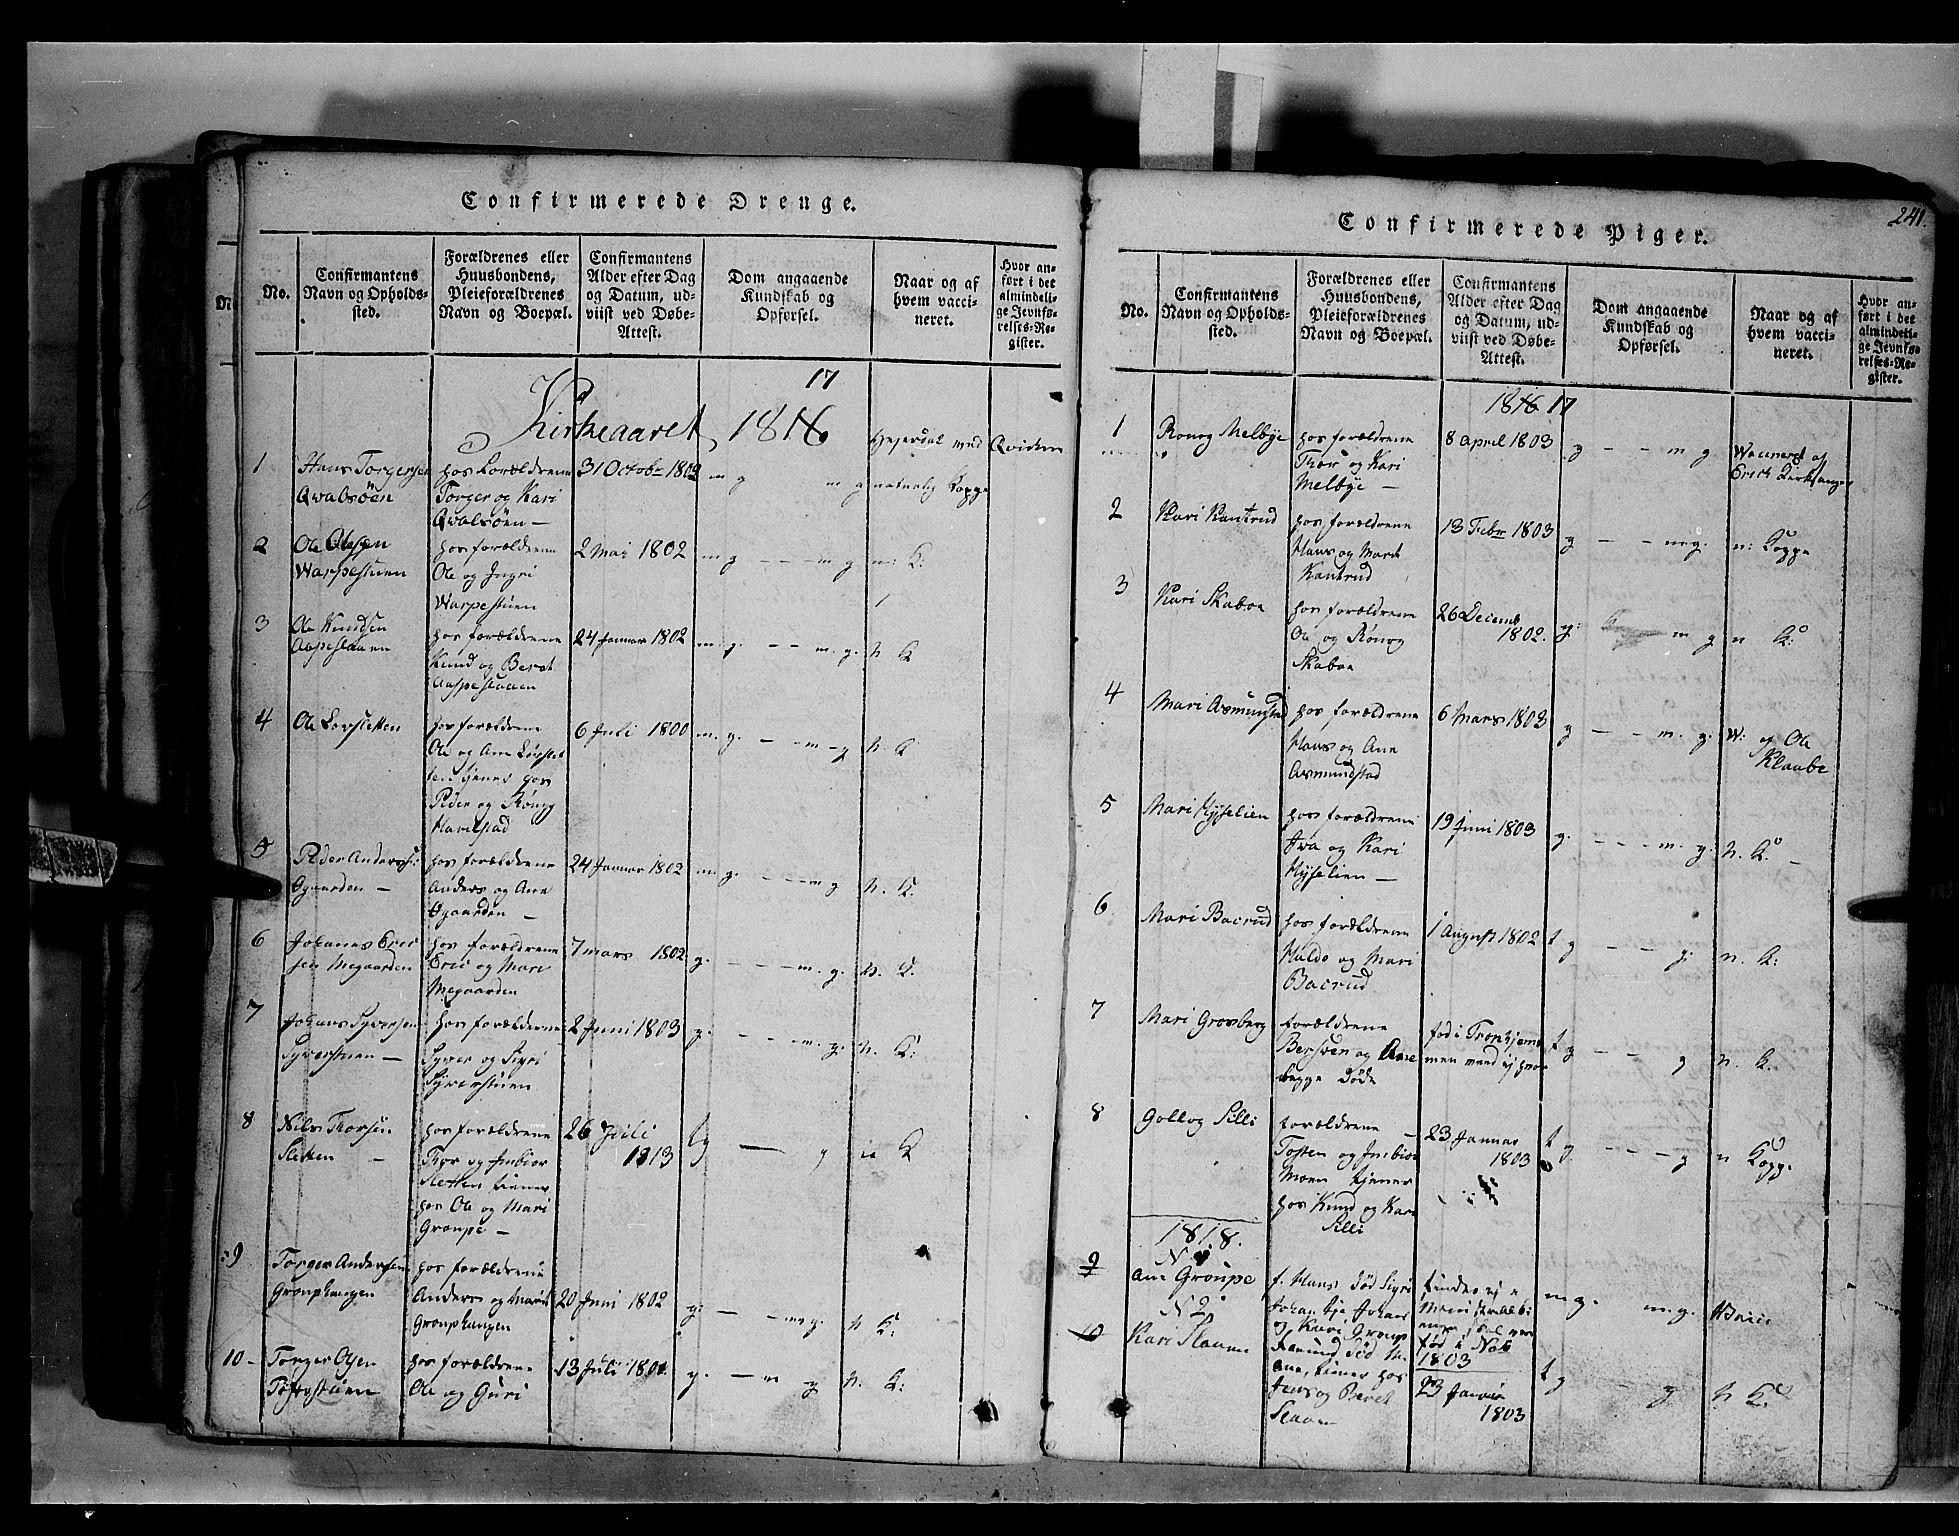 SAH, Fron prestekontor, H/Ha/Hab/L0003: Klokkerbok nr. 3, 1816-1850, s. 241